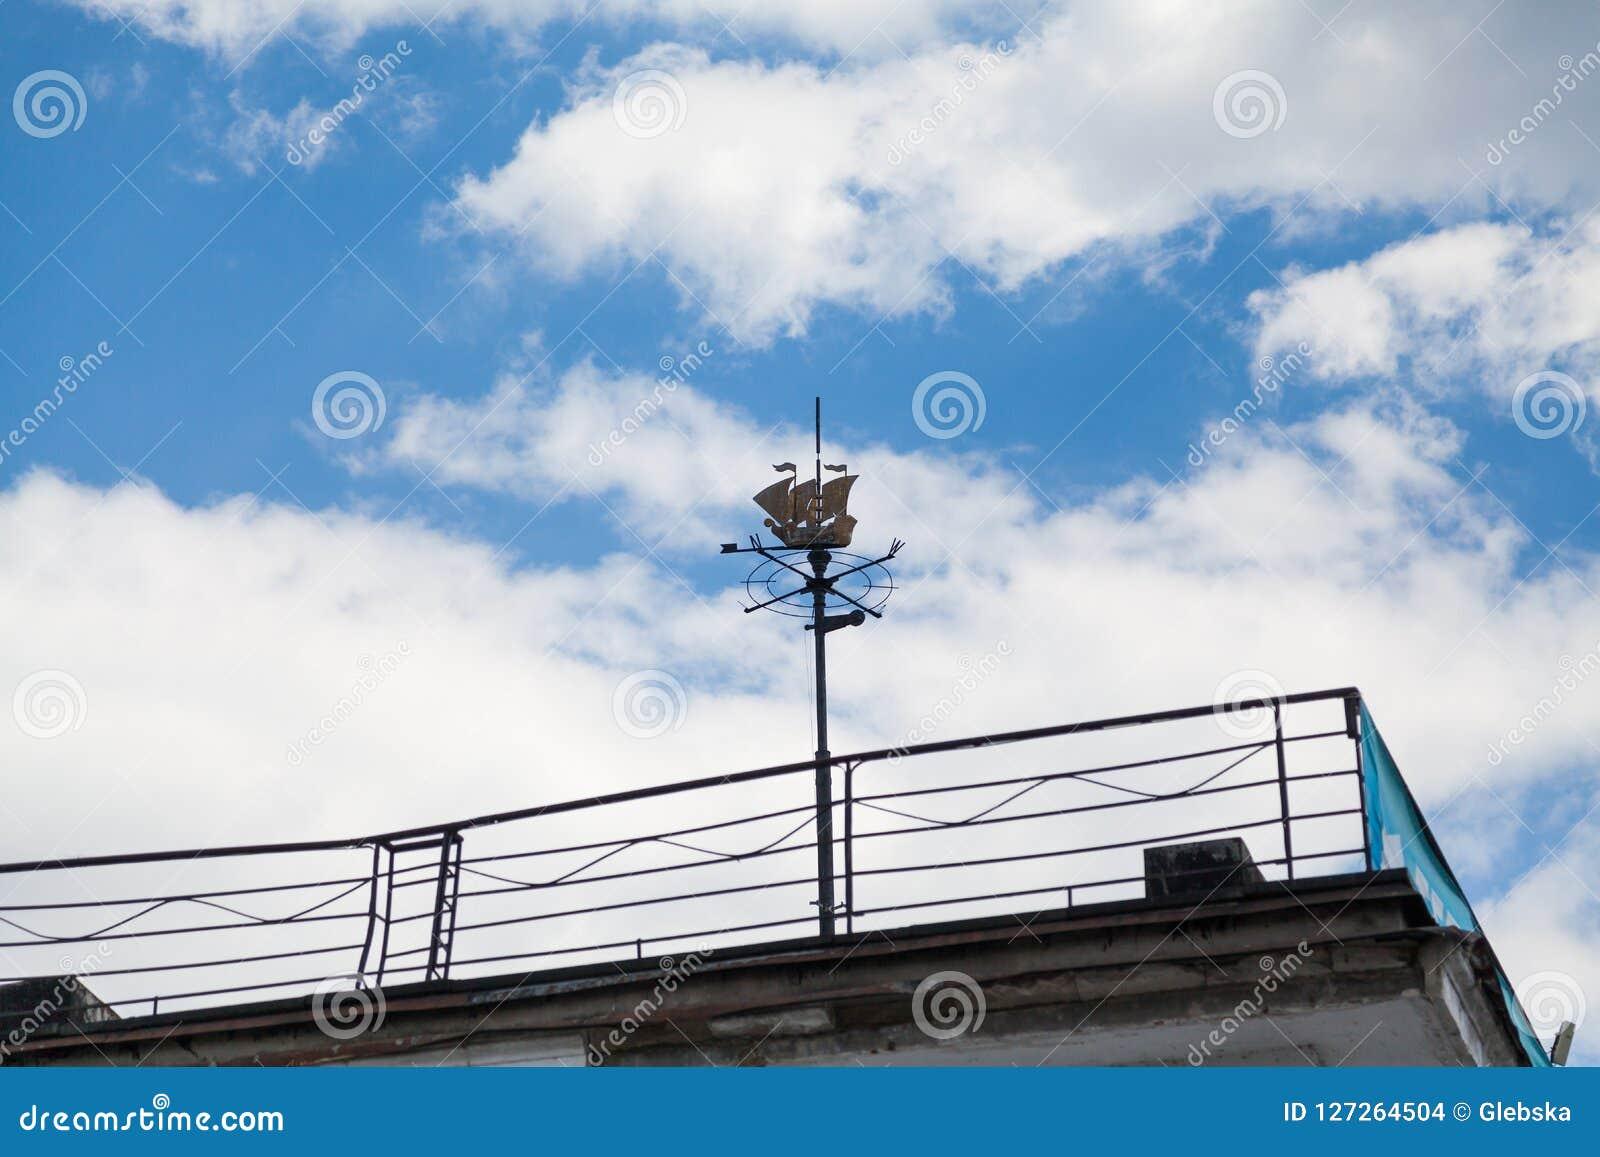 Modern Stylish Wind Vane With High Spike Stock Photo - Image of ...